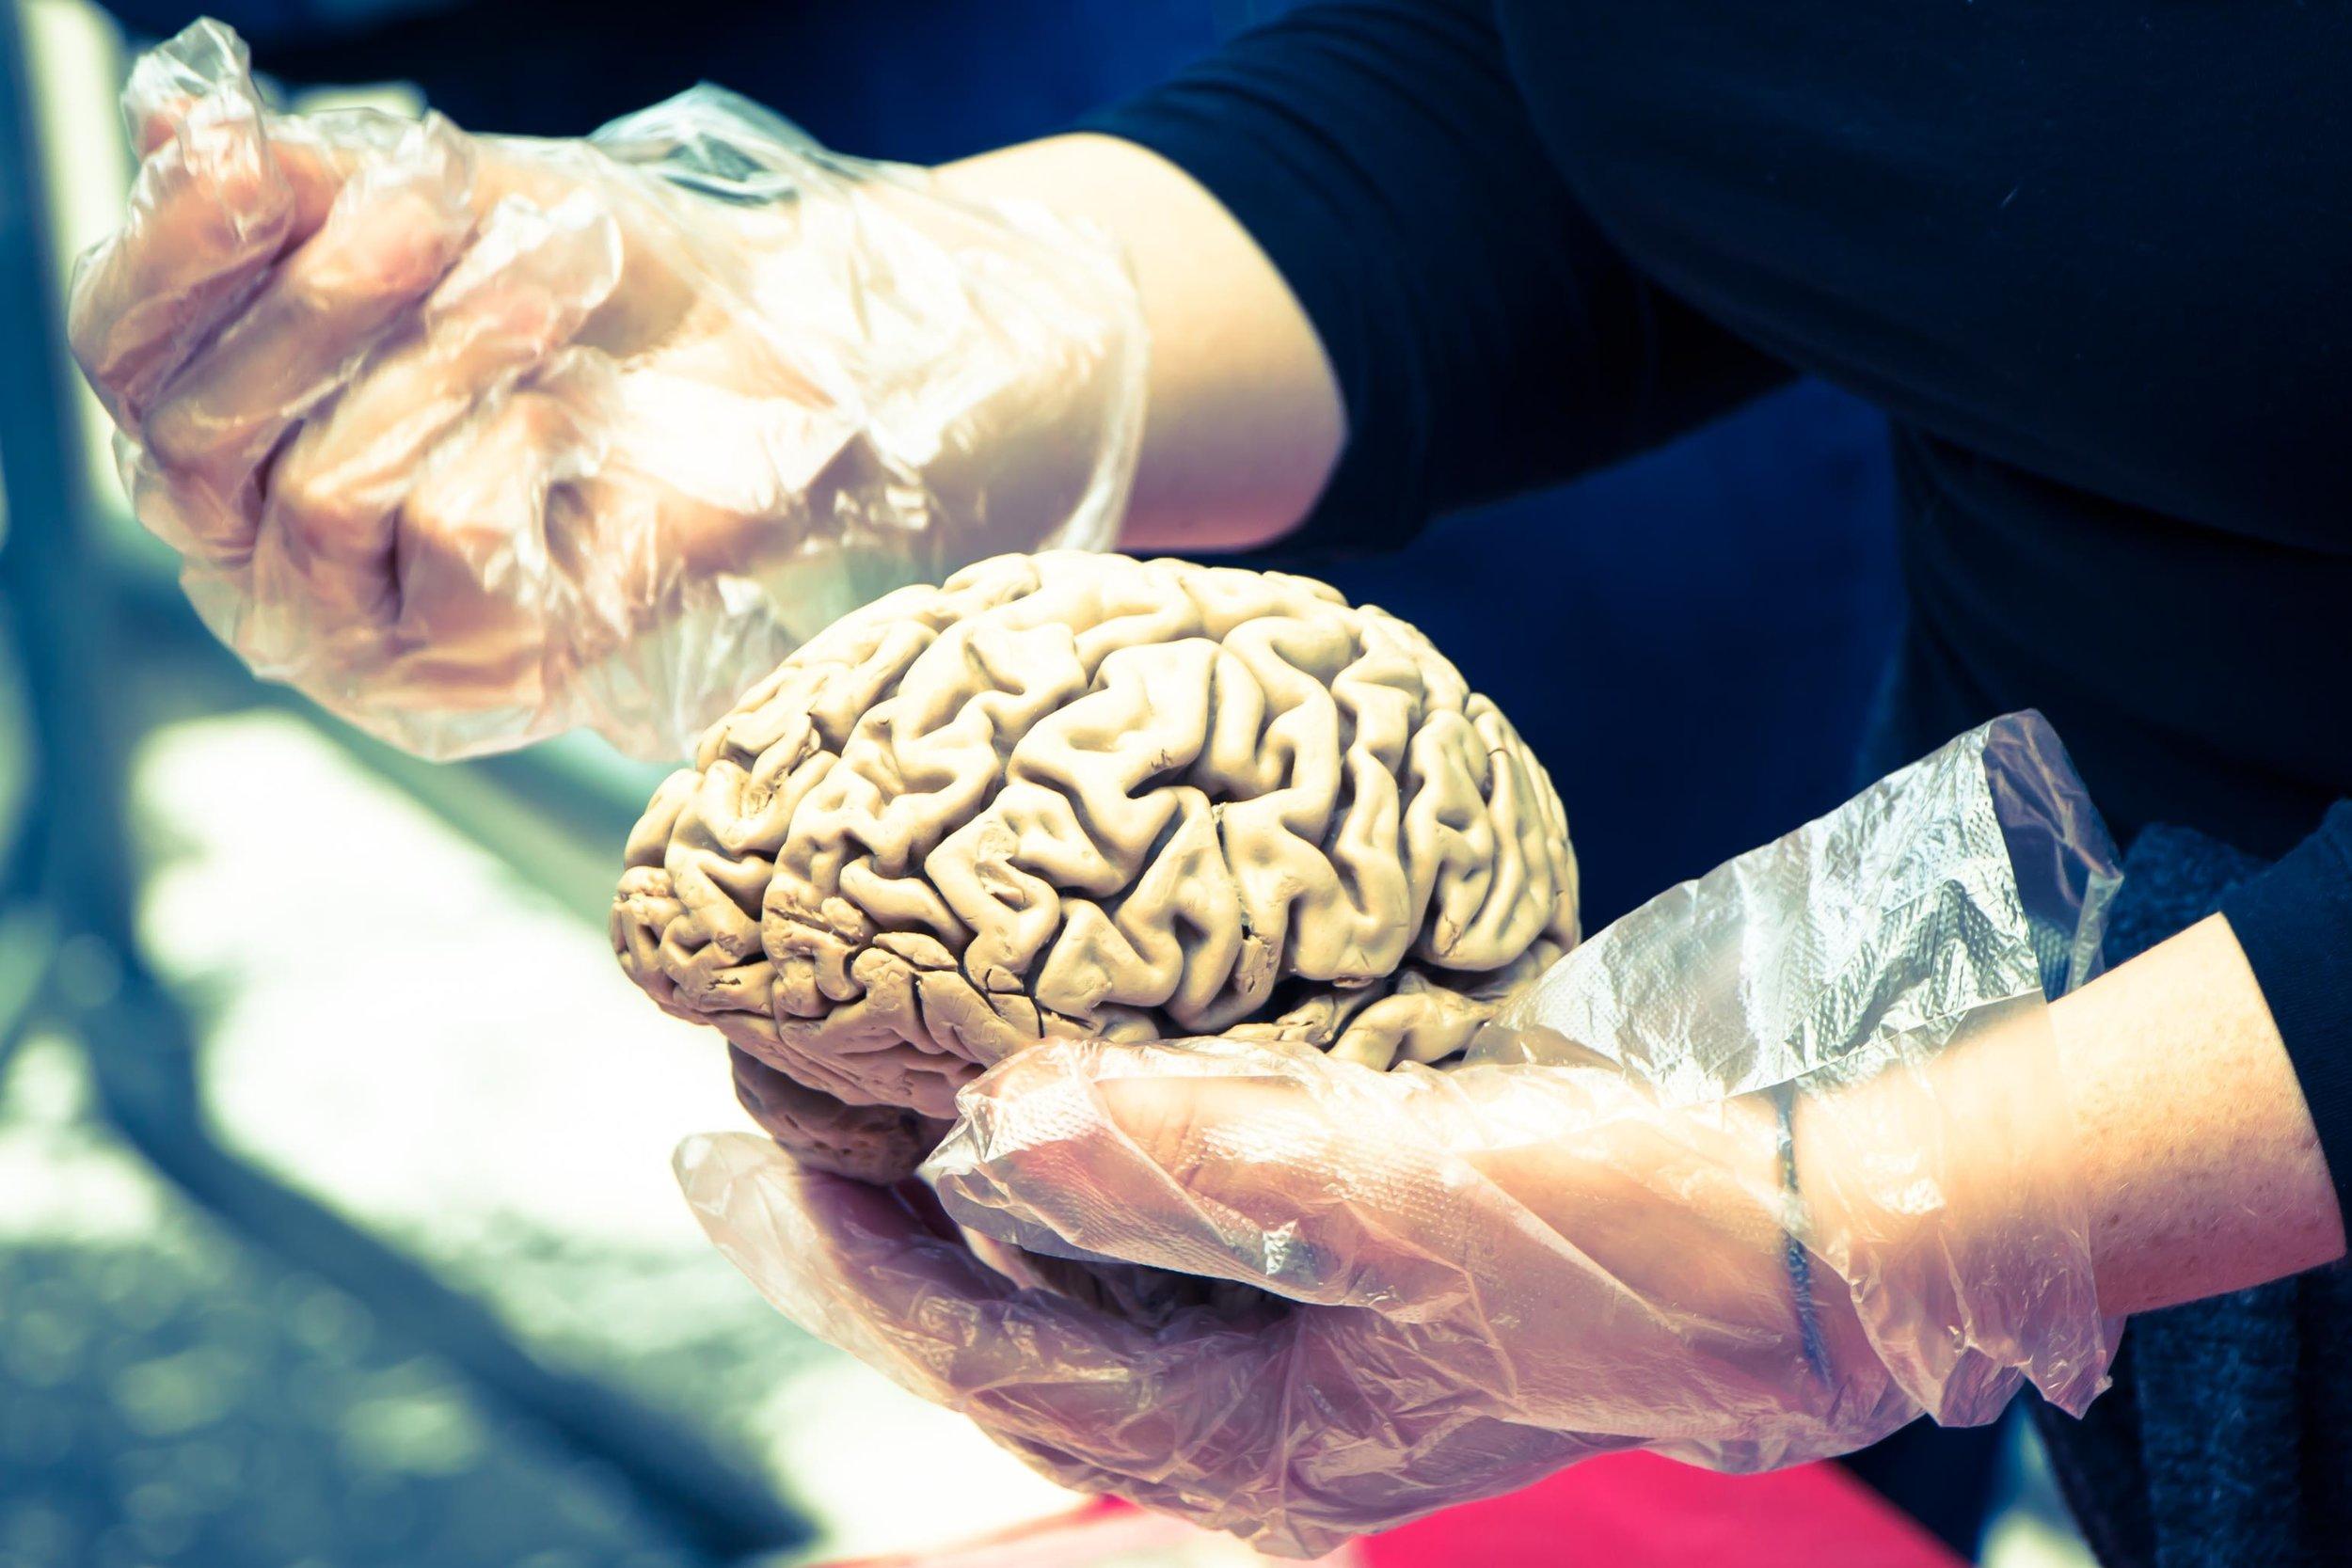 hand-biology-arm-muscle-human-body-brain-14176-pxhere.com (1).jpg